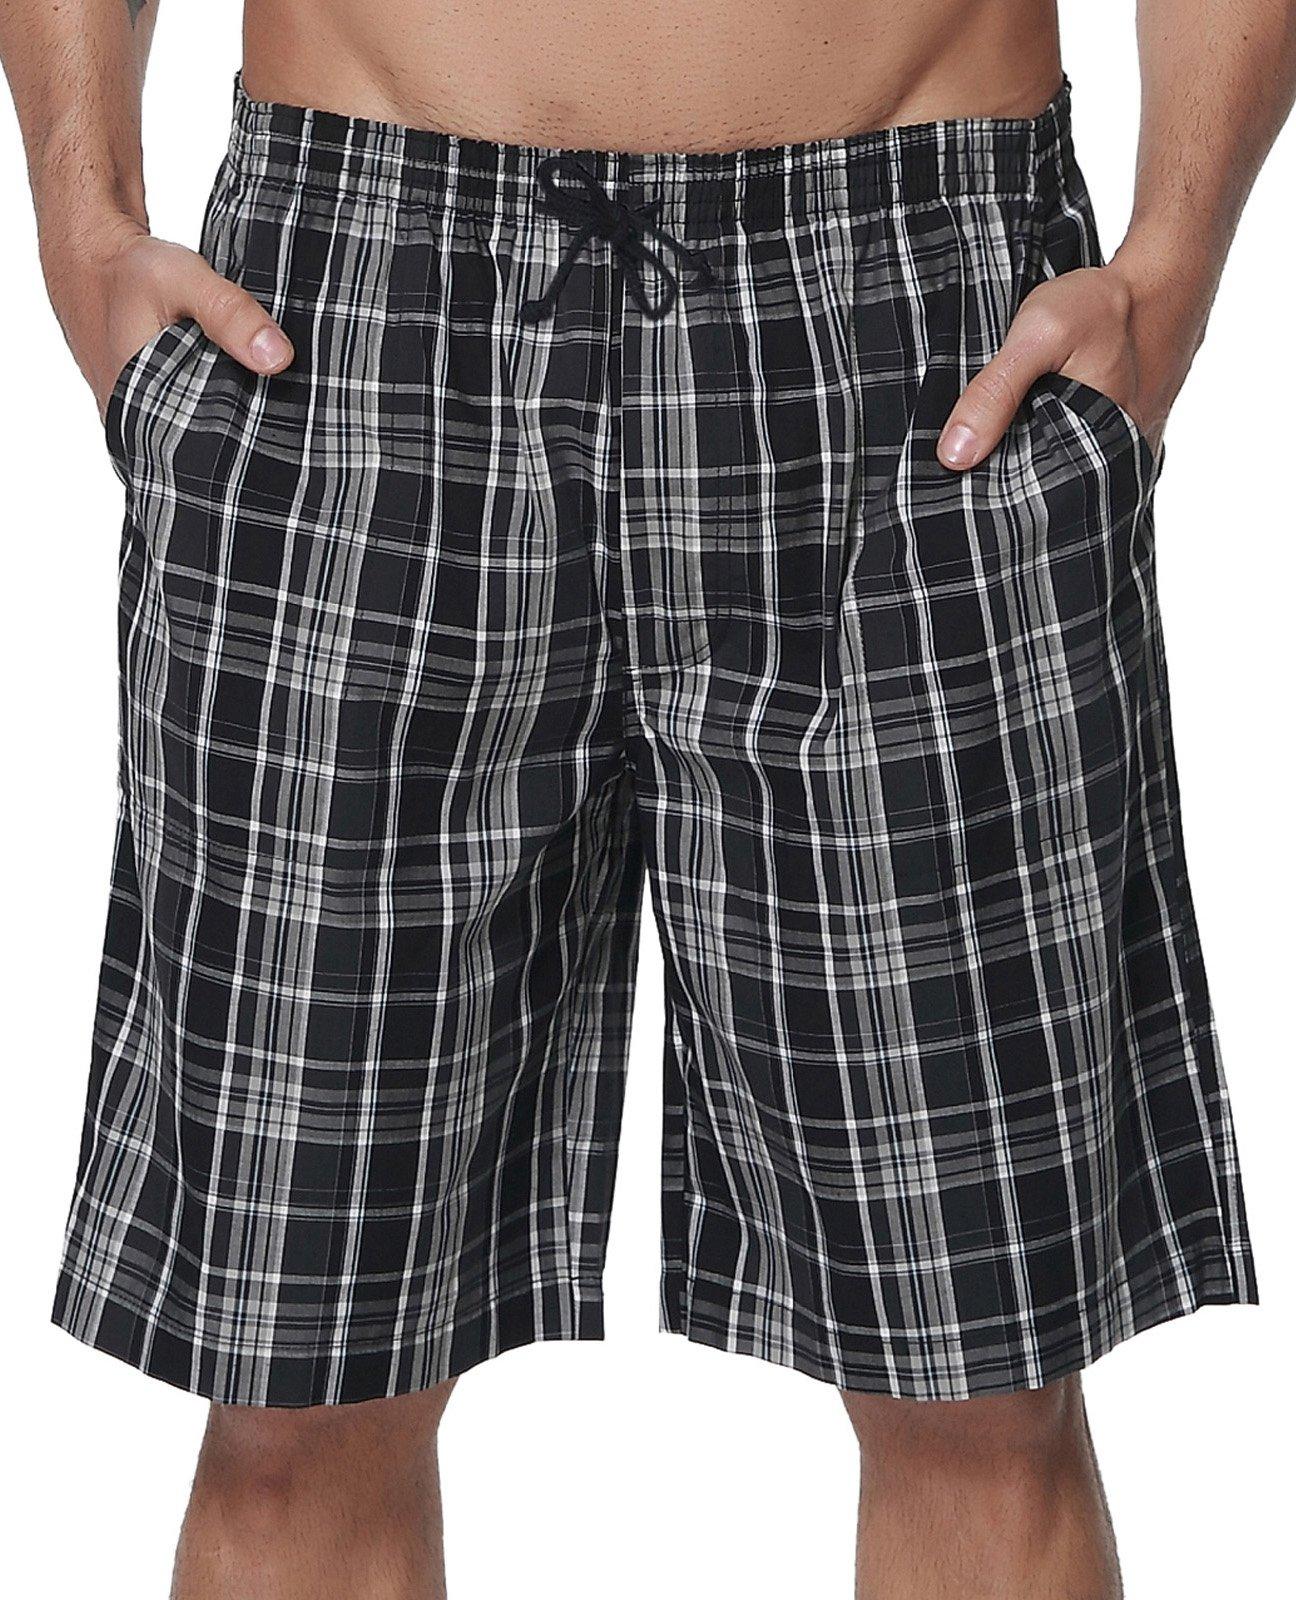 PAUL JONES Men's Lounge Sleep Shorts Casual Plaid Shorts Size 2XL by PAUL JONES